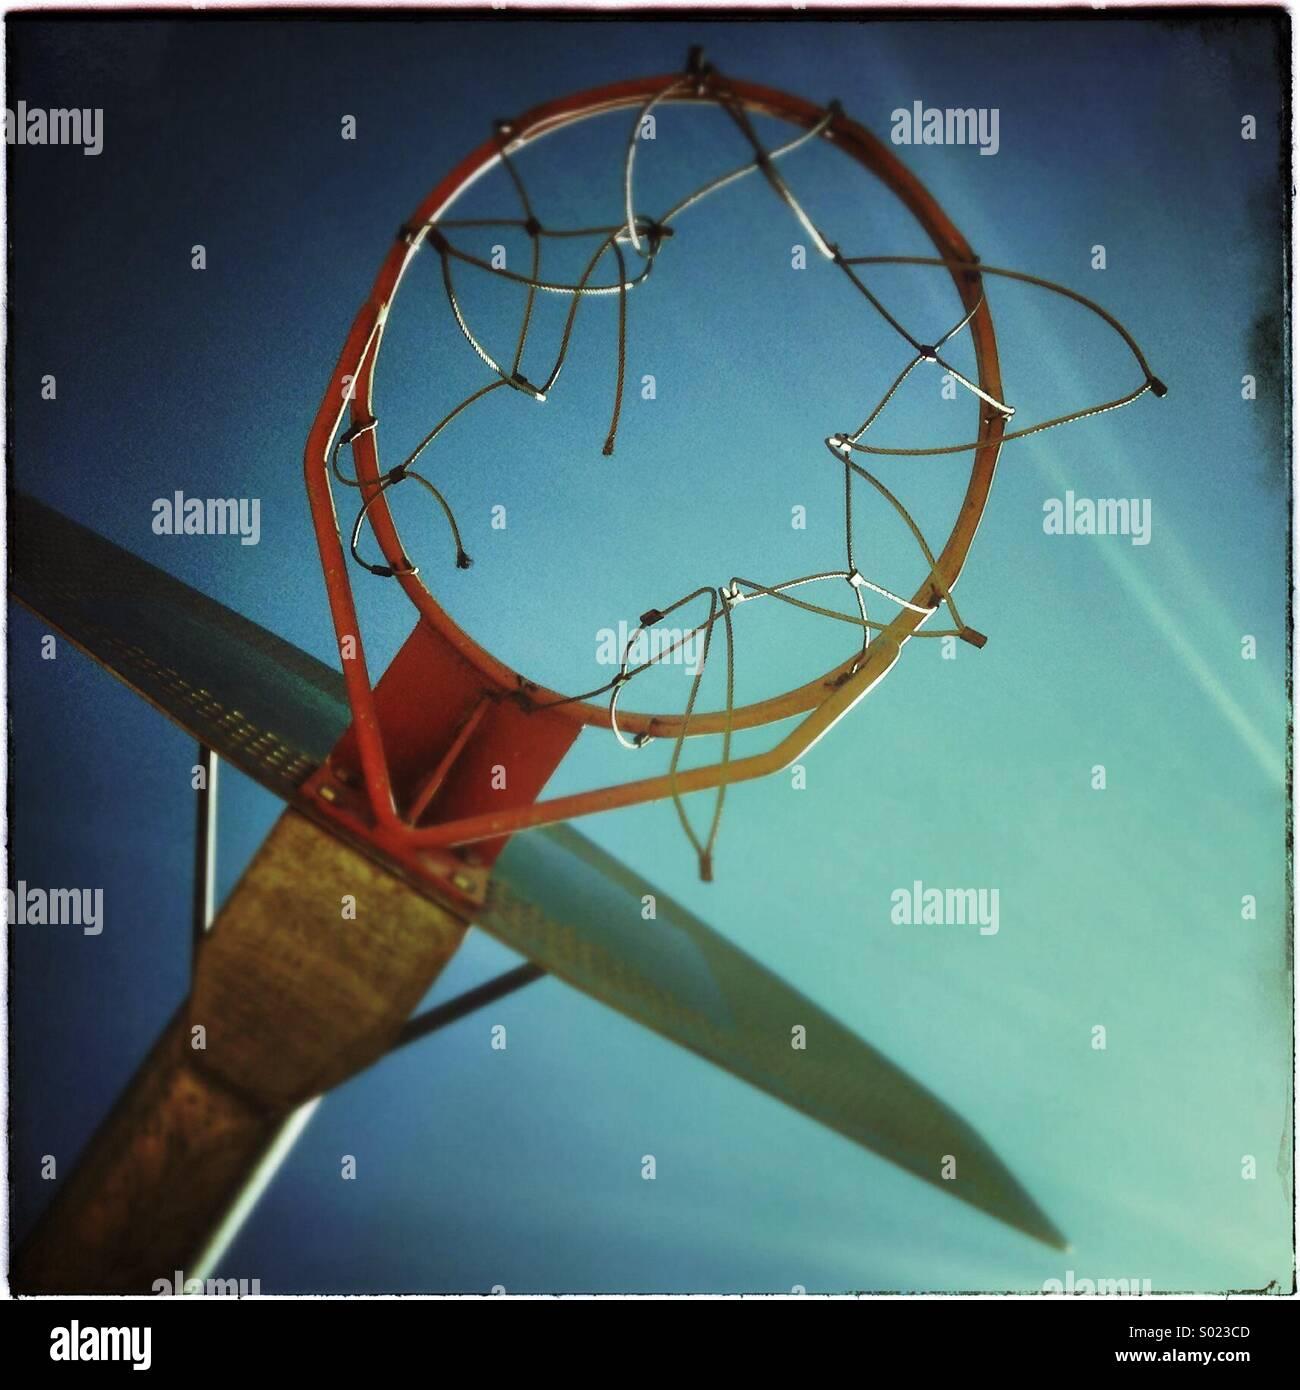 Basketball hoop on a clear blue sky - Stock Image